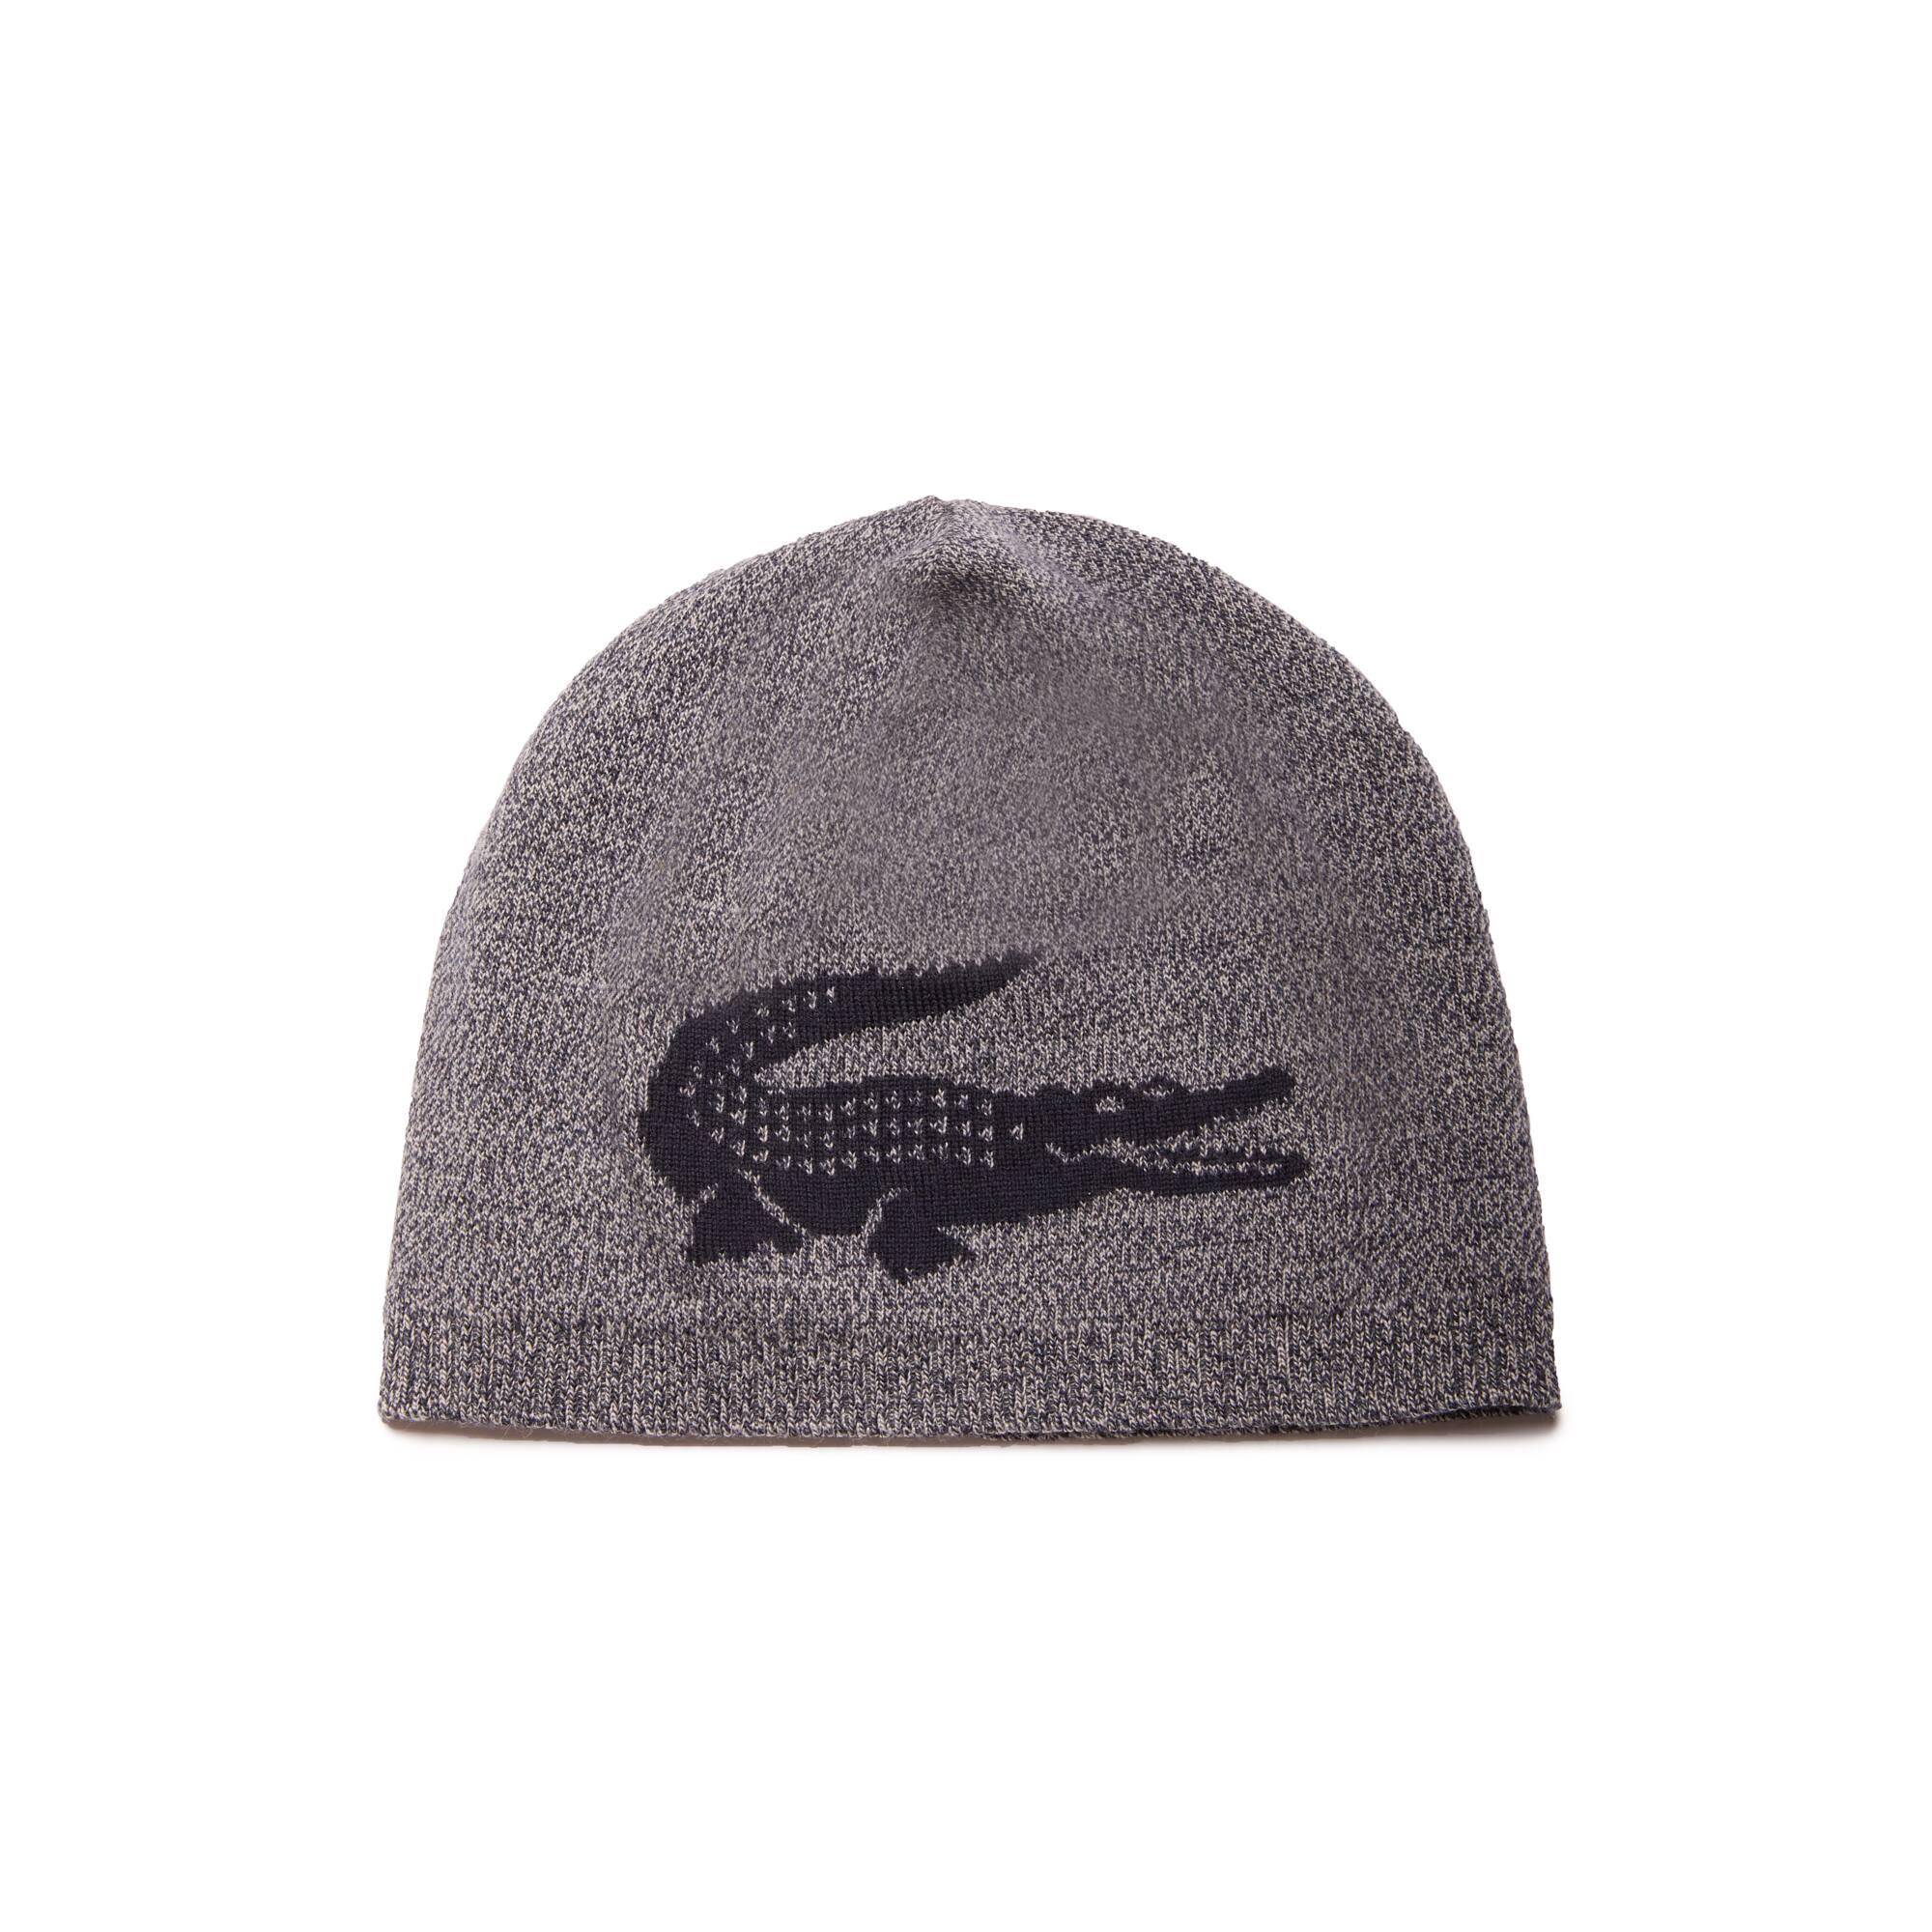 Men's Jacquard Crocodile Wool Beanie